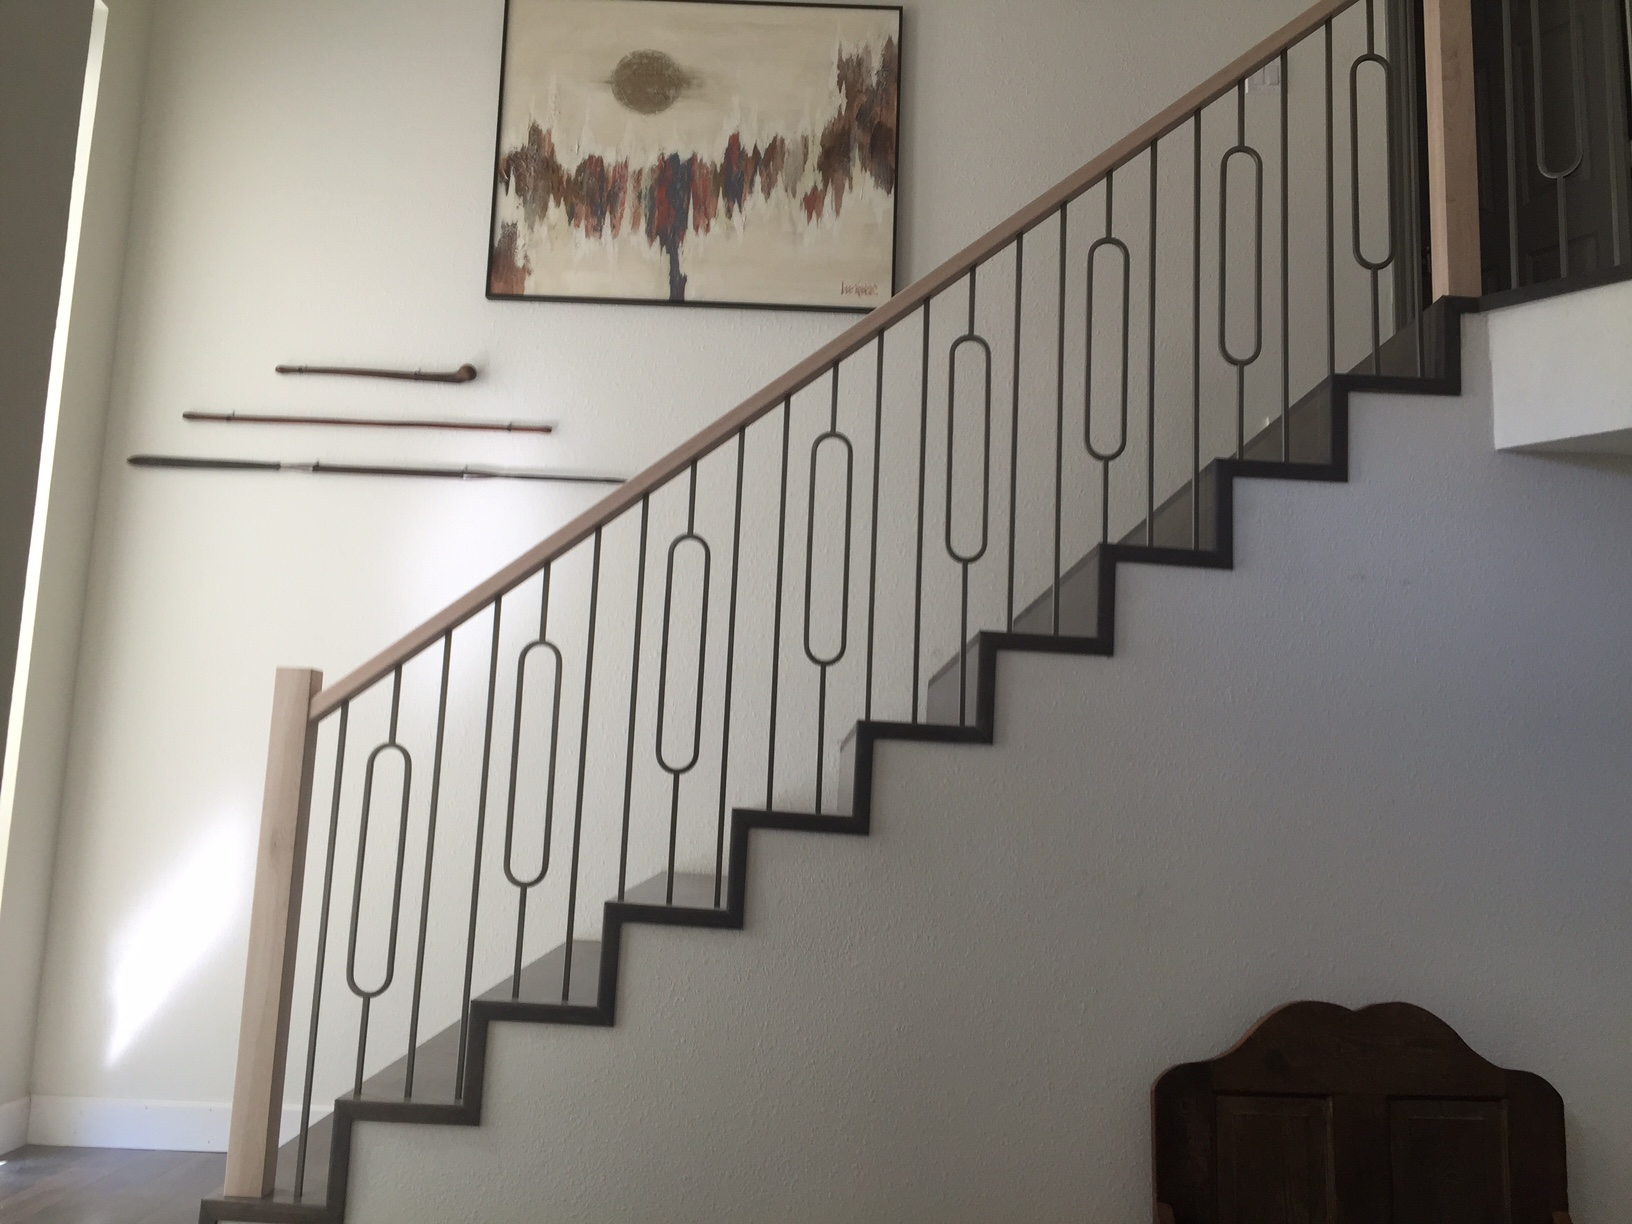 Chris Holman Staircase with 4002 Newel Posts